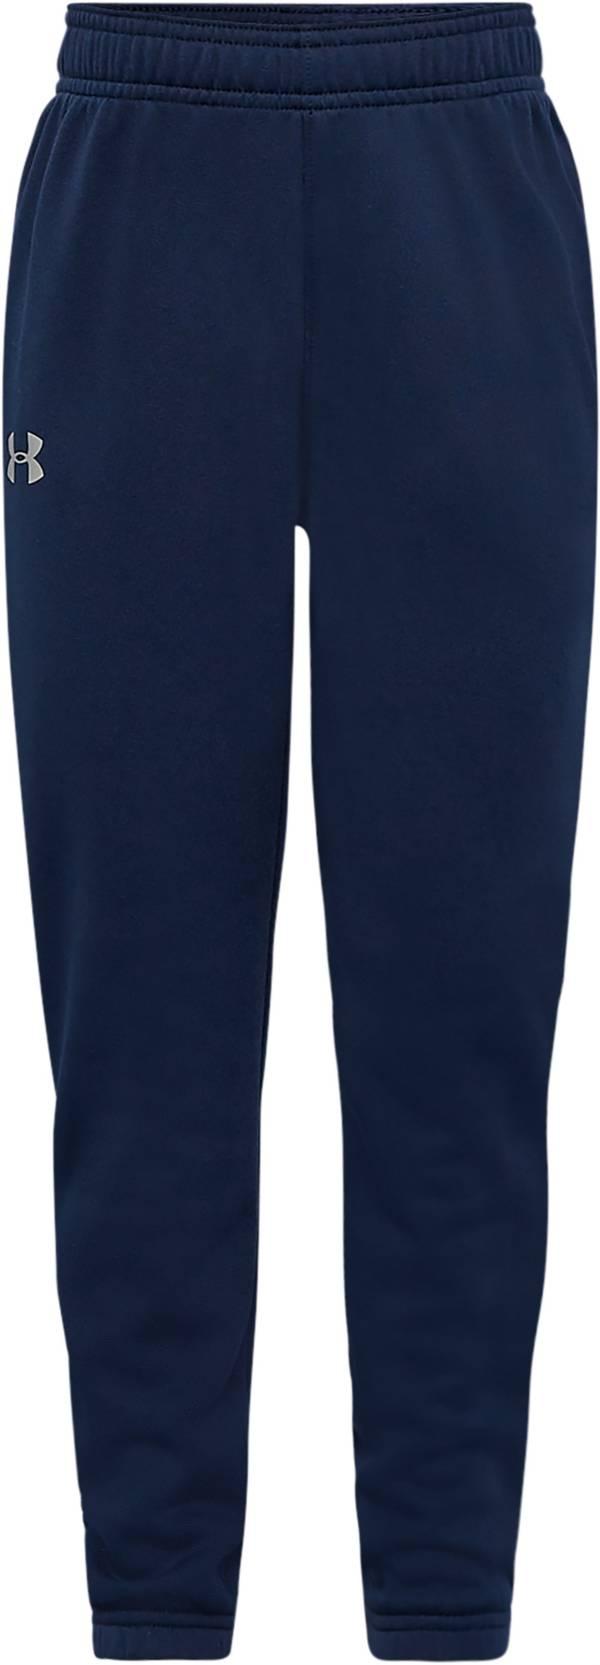 Under Armour Little Boys' Armour Fleece Jogger Pants product image